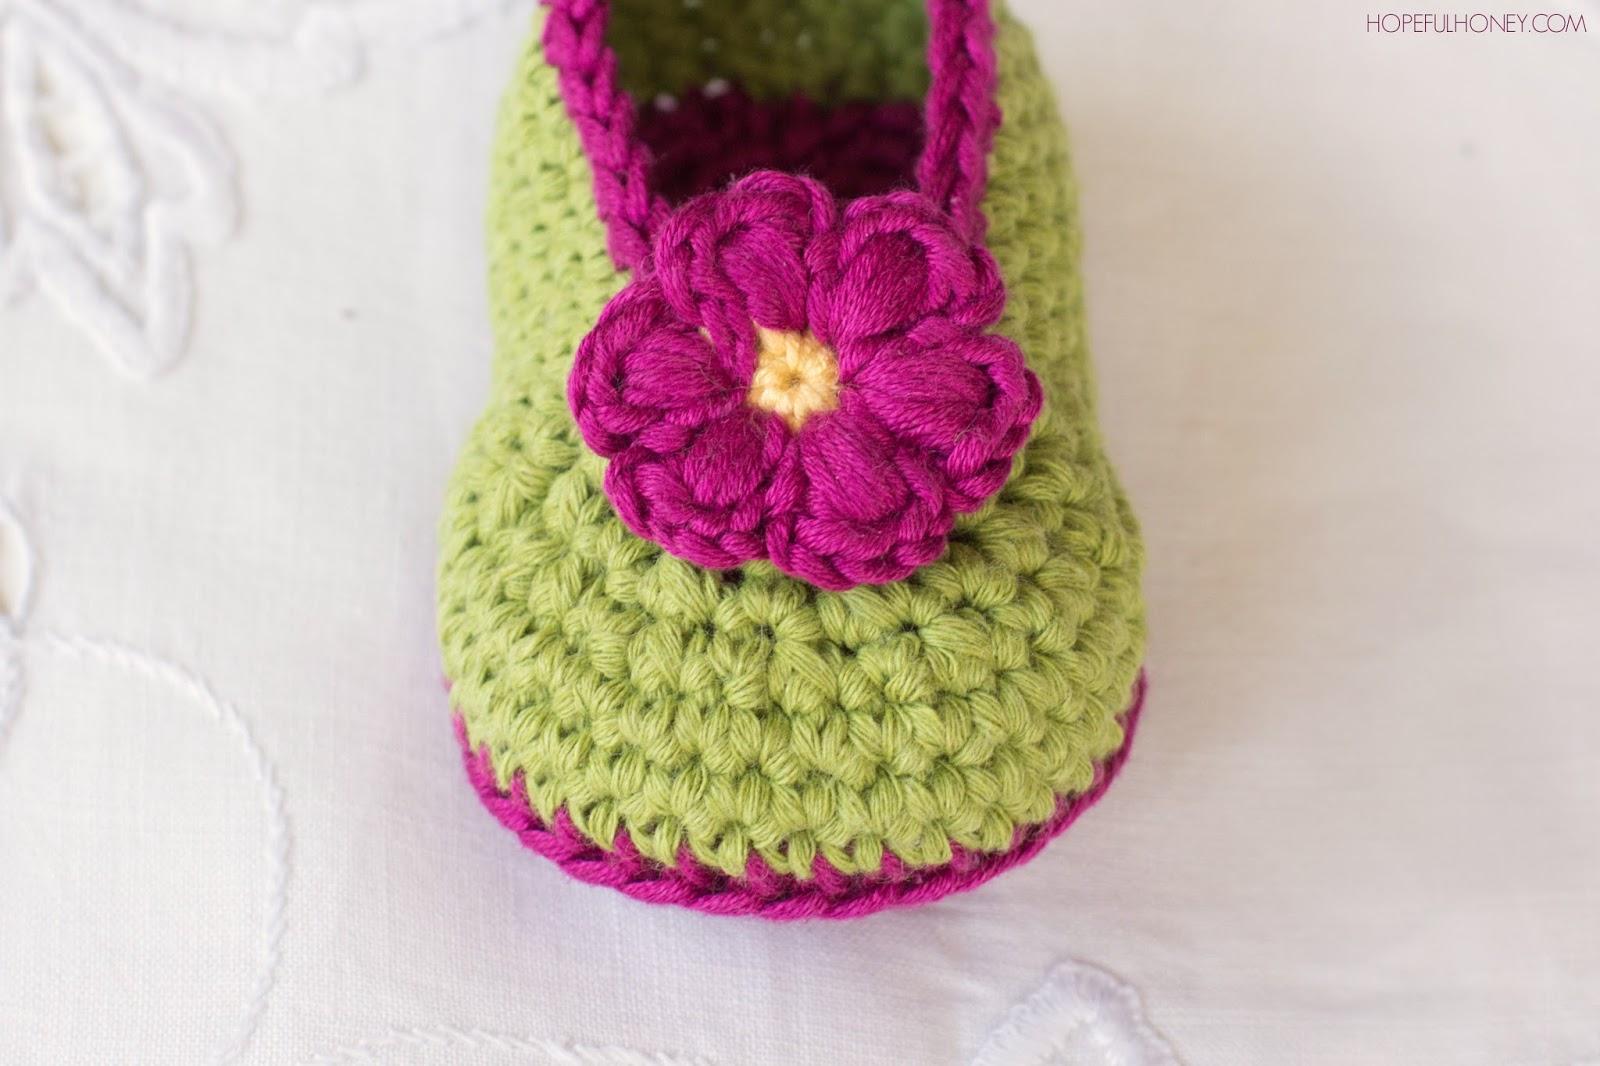 Hopeful Honey Craft, Crochet, Create: Fairy Blossom Baby ...